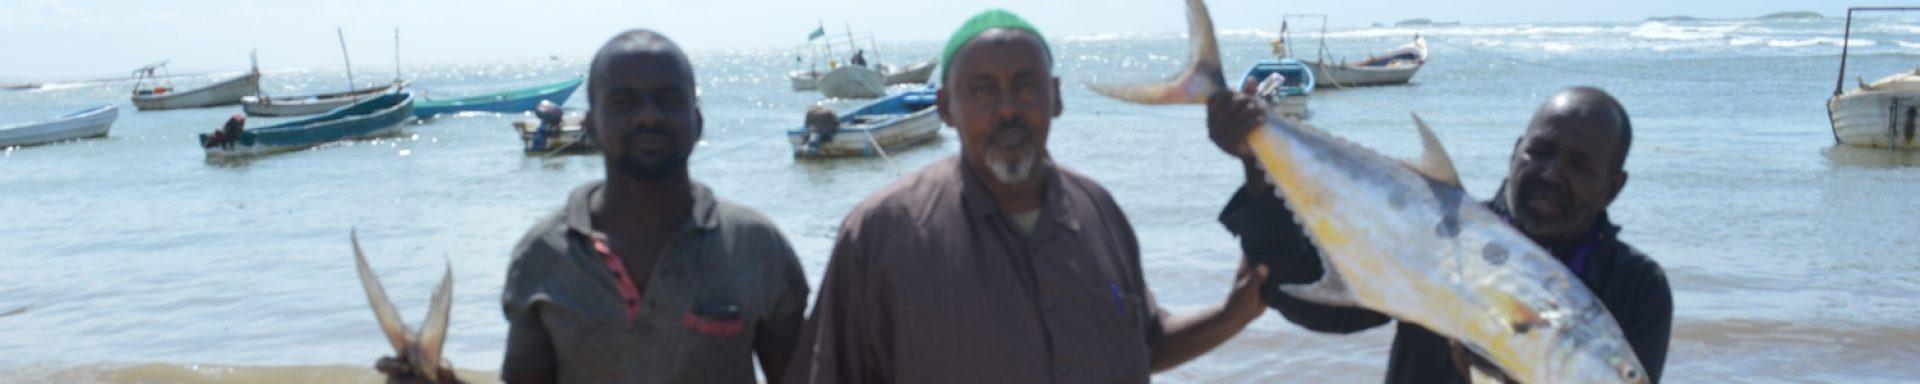 Steun 50 vissers in Somalië